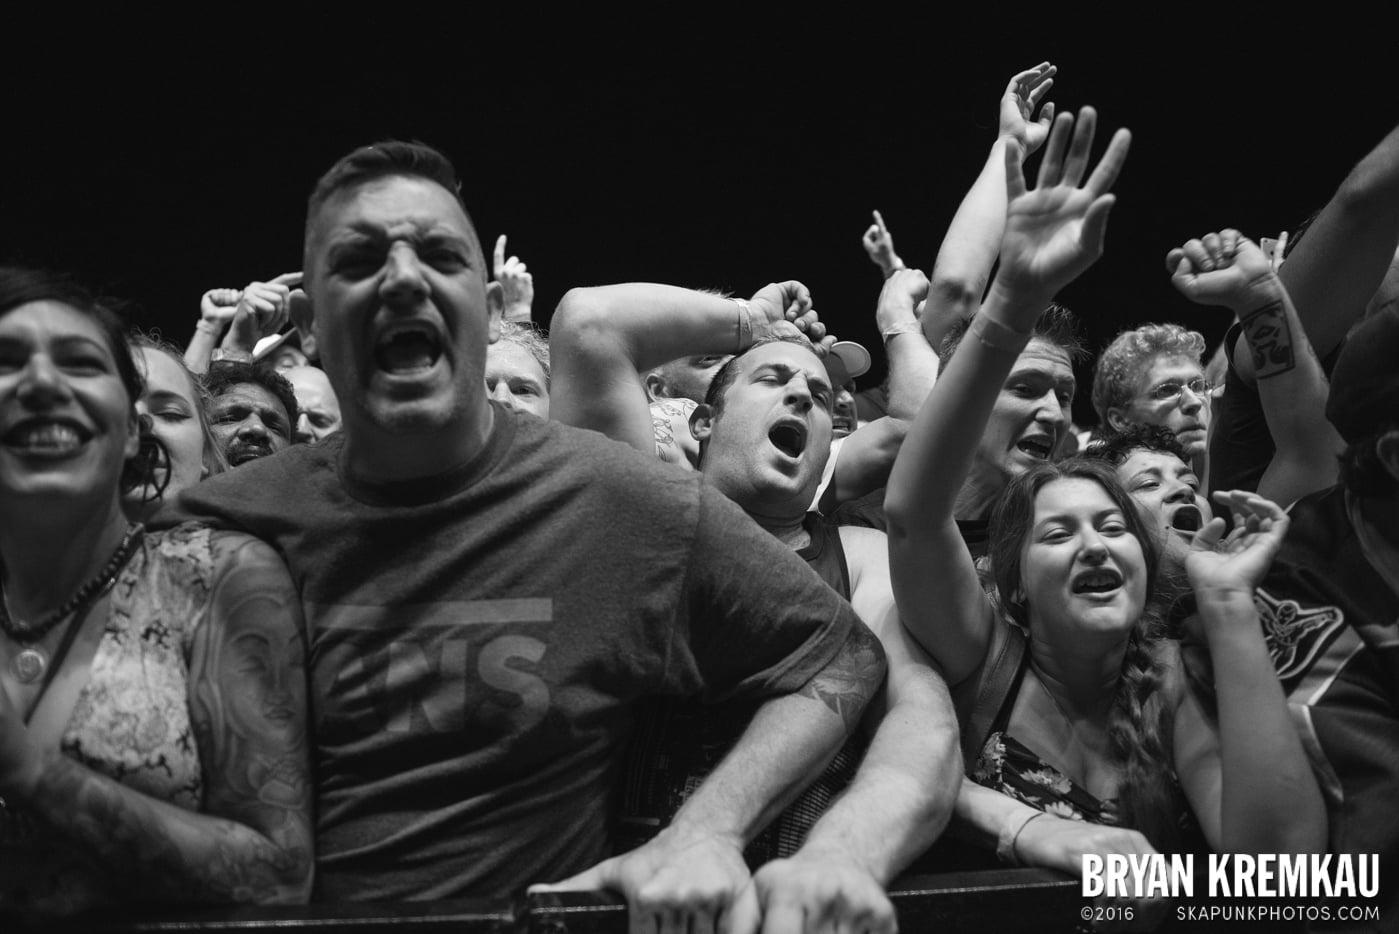 NOFX @ Stone Pony Summer Stage, Asbury Park, NJ - 8.15.15 (11)